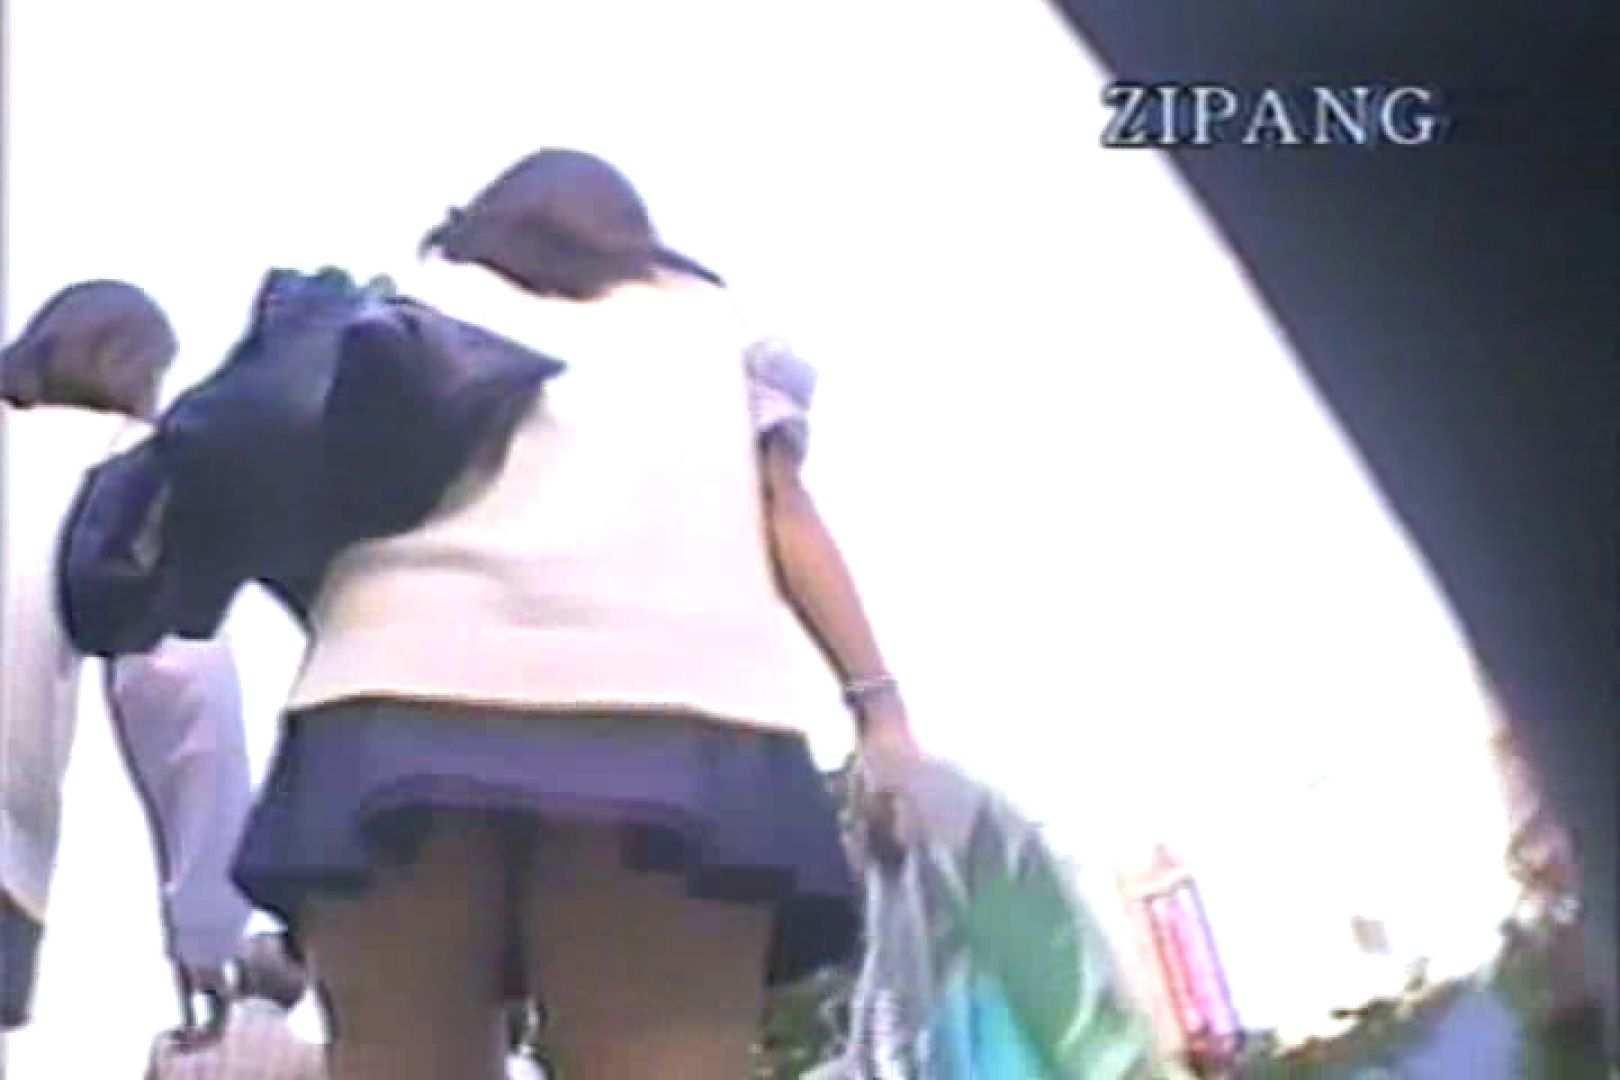 盗撮 女子大生生パン大特集nn4 女子大生 盗撮セックス無修正動画無料 52pic 11